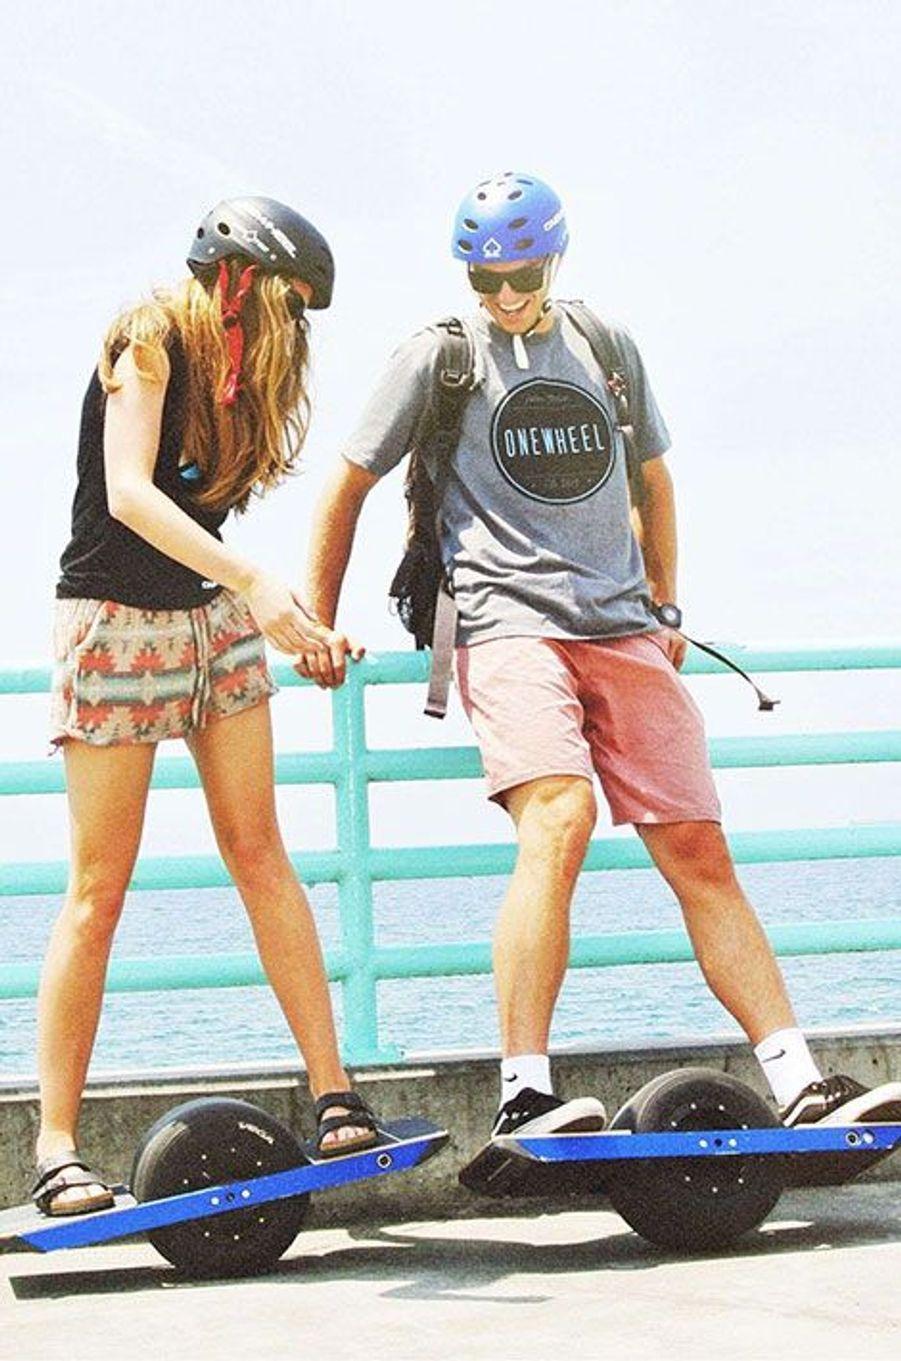 L'Onewheel révolutionne le skateboard